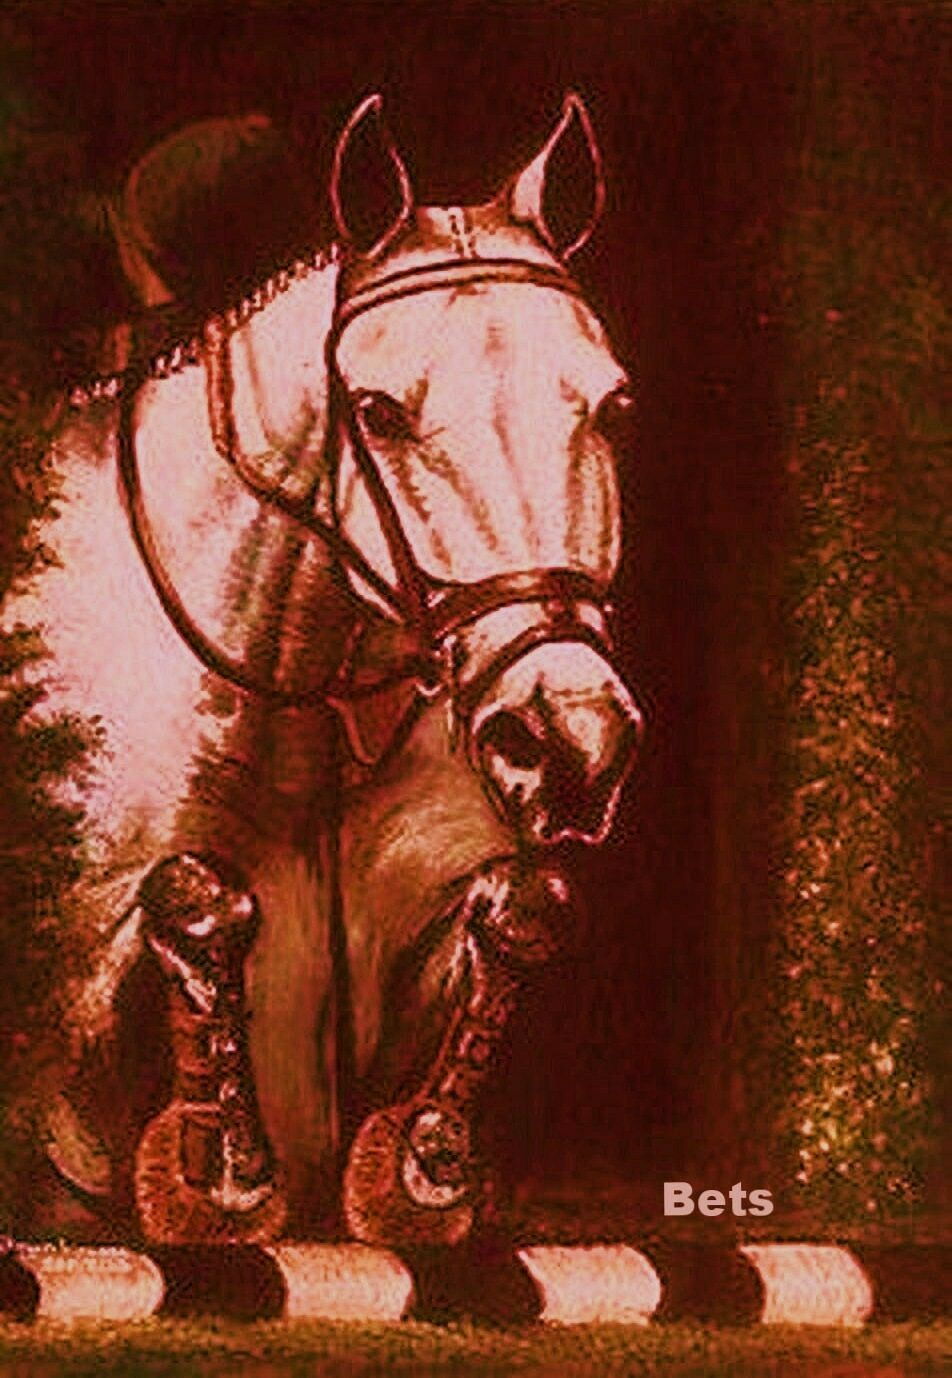 HORSE PRINT Giclee JUMPER Art NO FAULTS artist BETS  3 COLORS print size 14 X 19